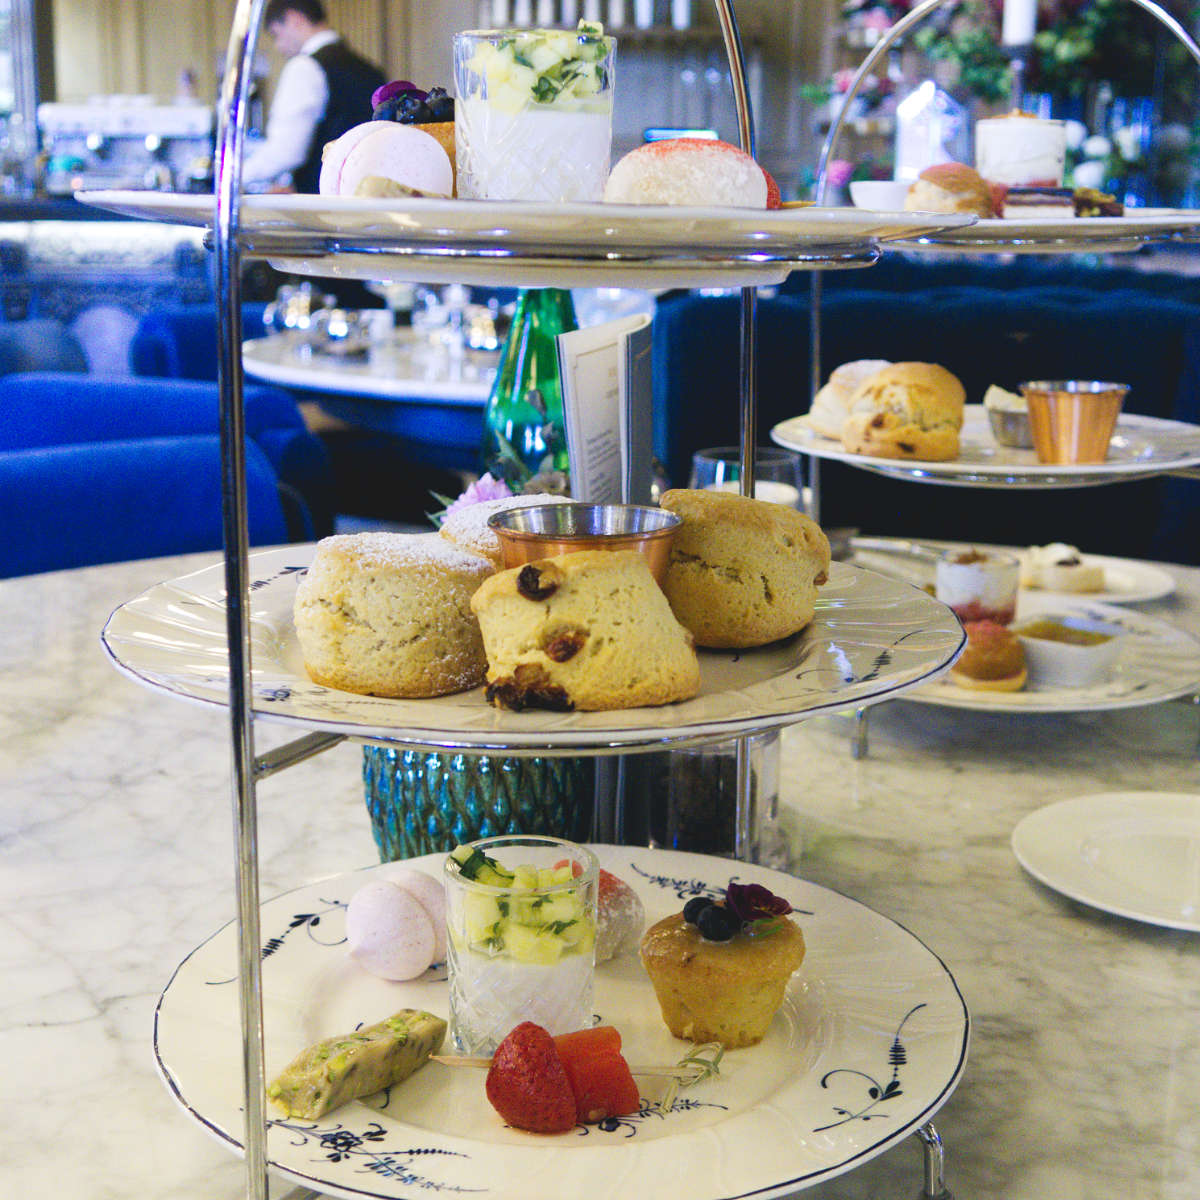 Vegan afternoon tea at The Grand Cafe, Edinburgh